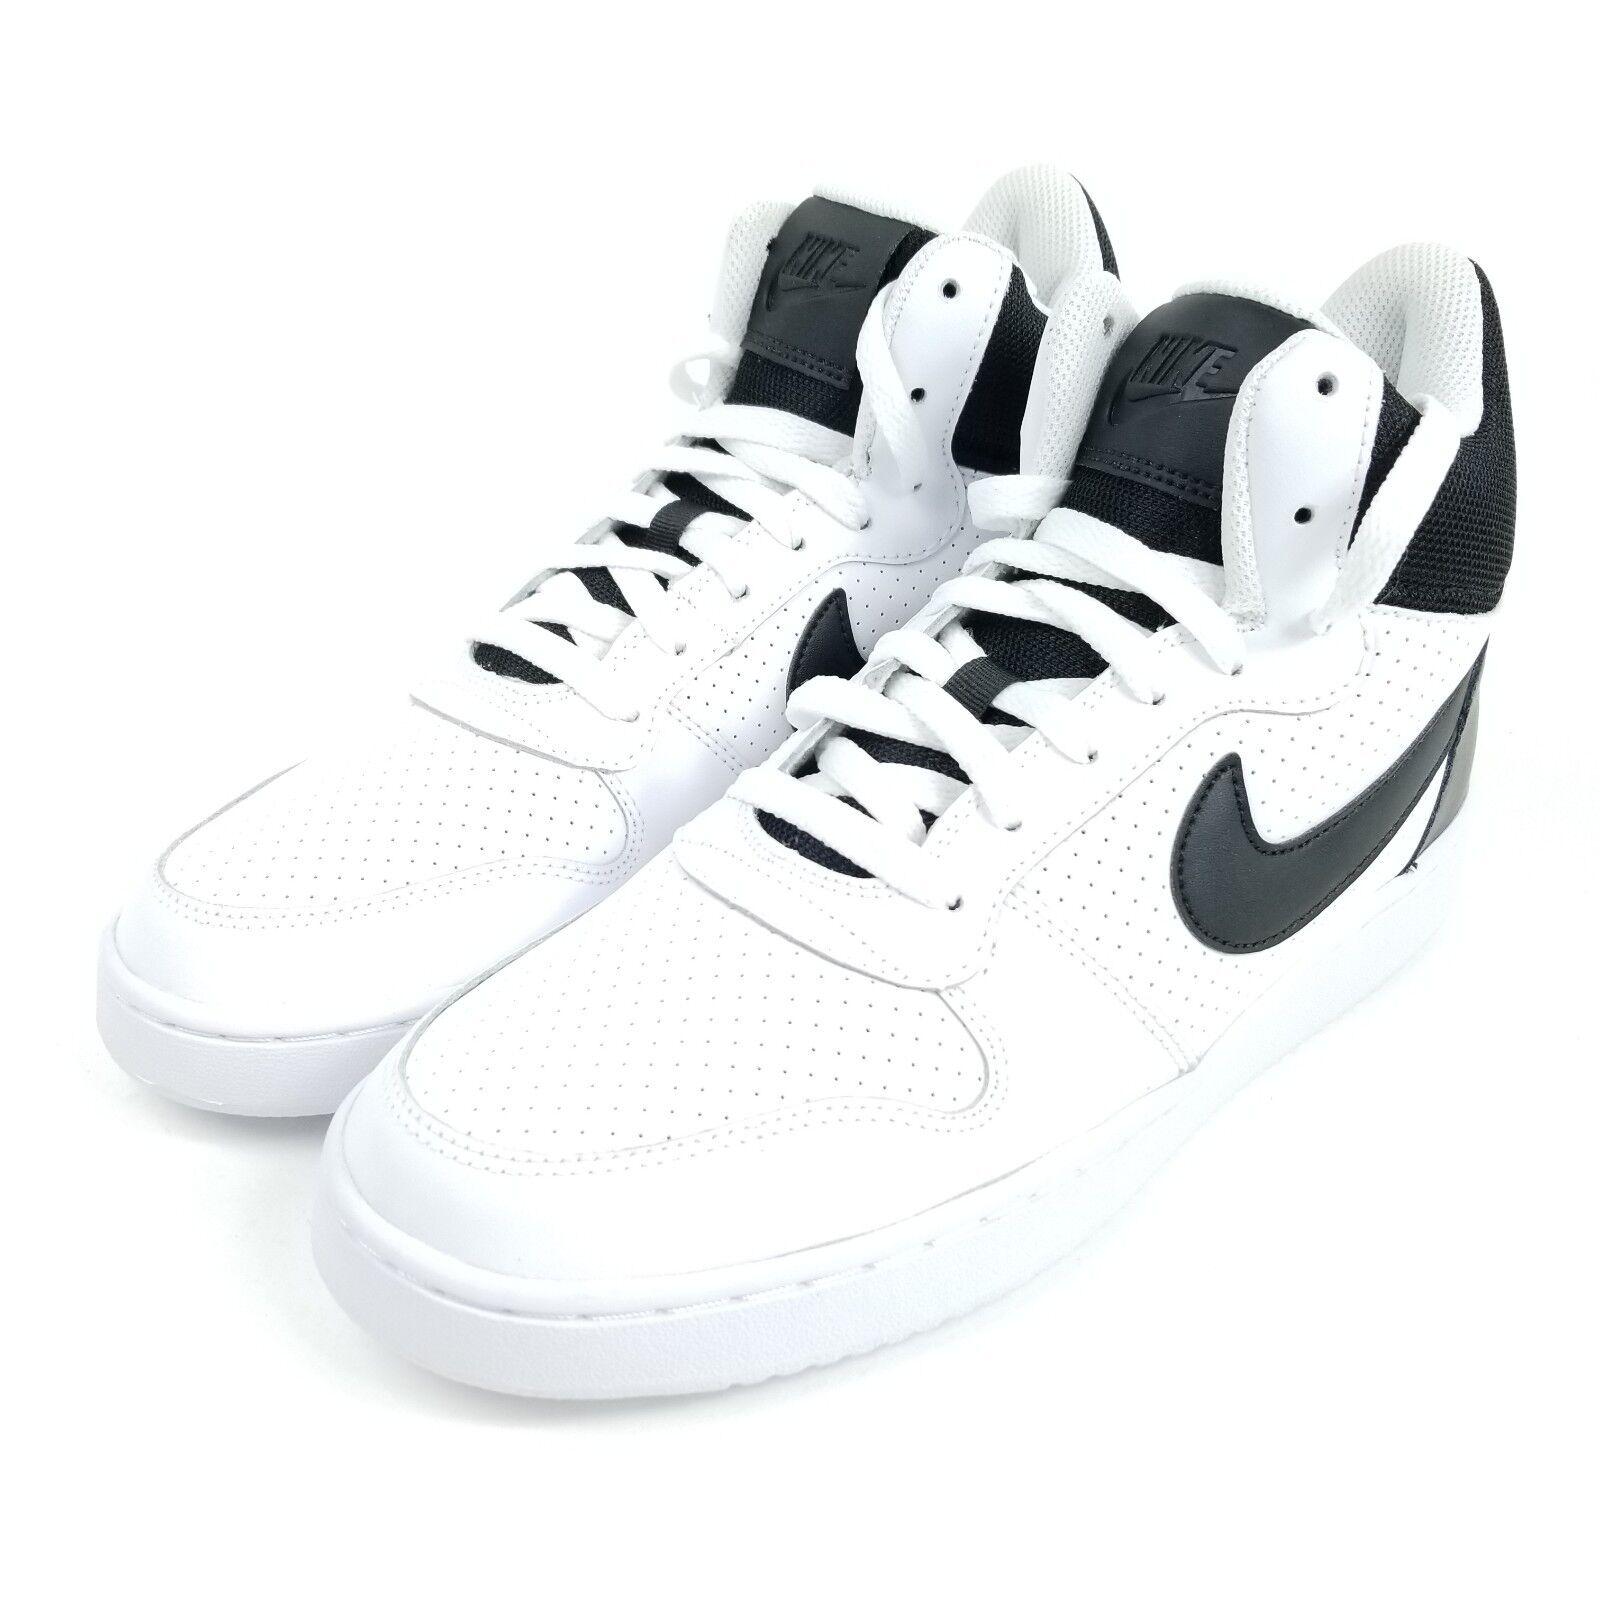 Nike corte borough metà Uomo scarpe sz 9,5 scarpe Uomo bianco nero 838938 100 b28240